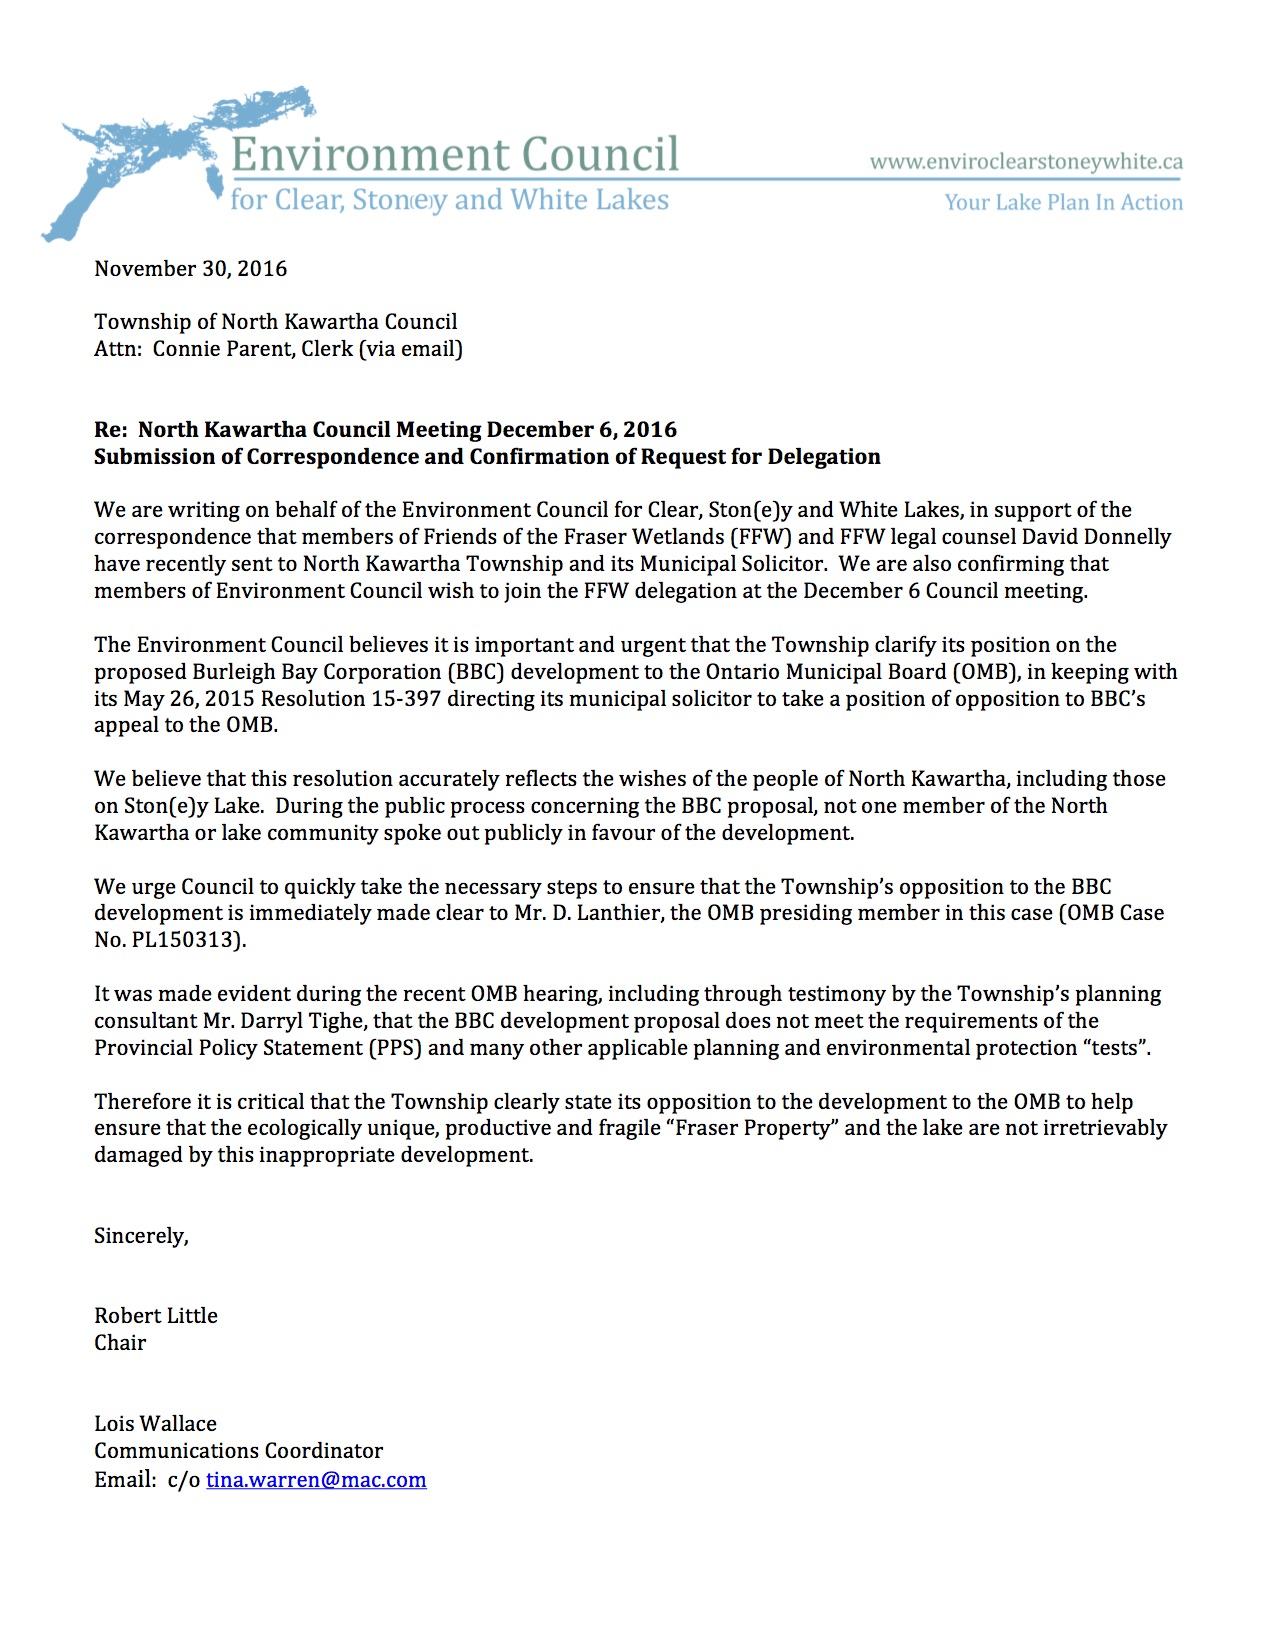 Delegation letter solarfm delegation of authority social media use altavistaventures Image collections